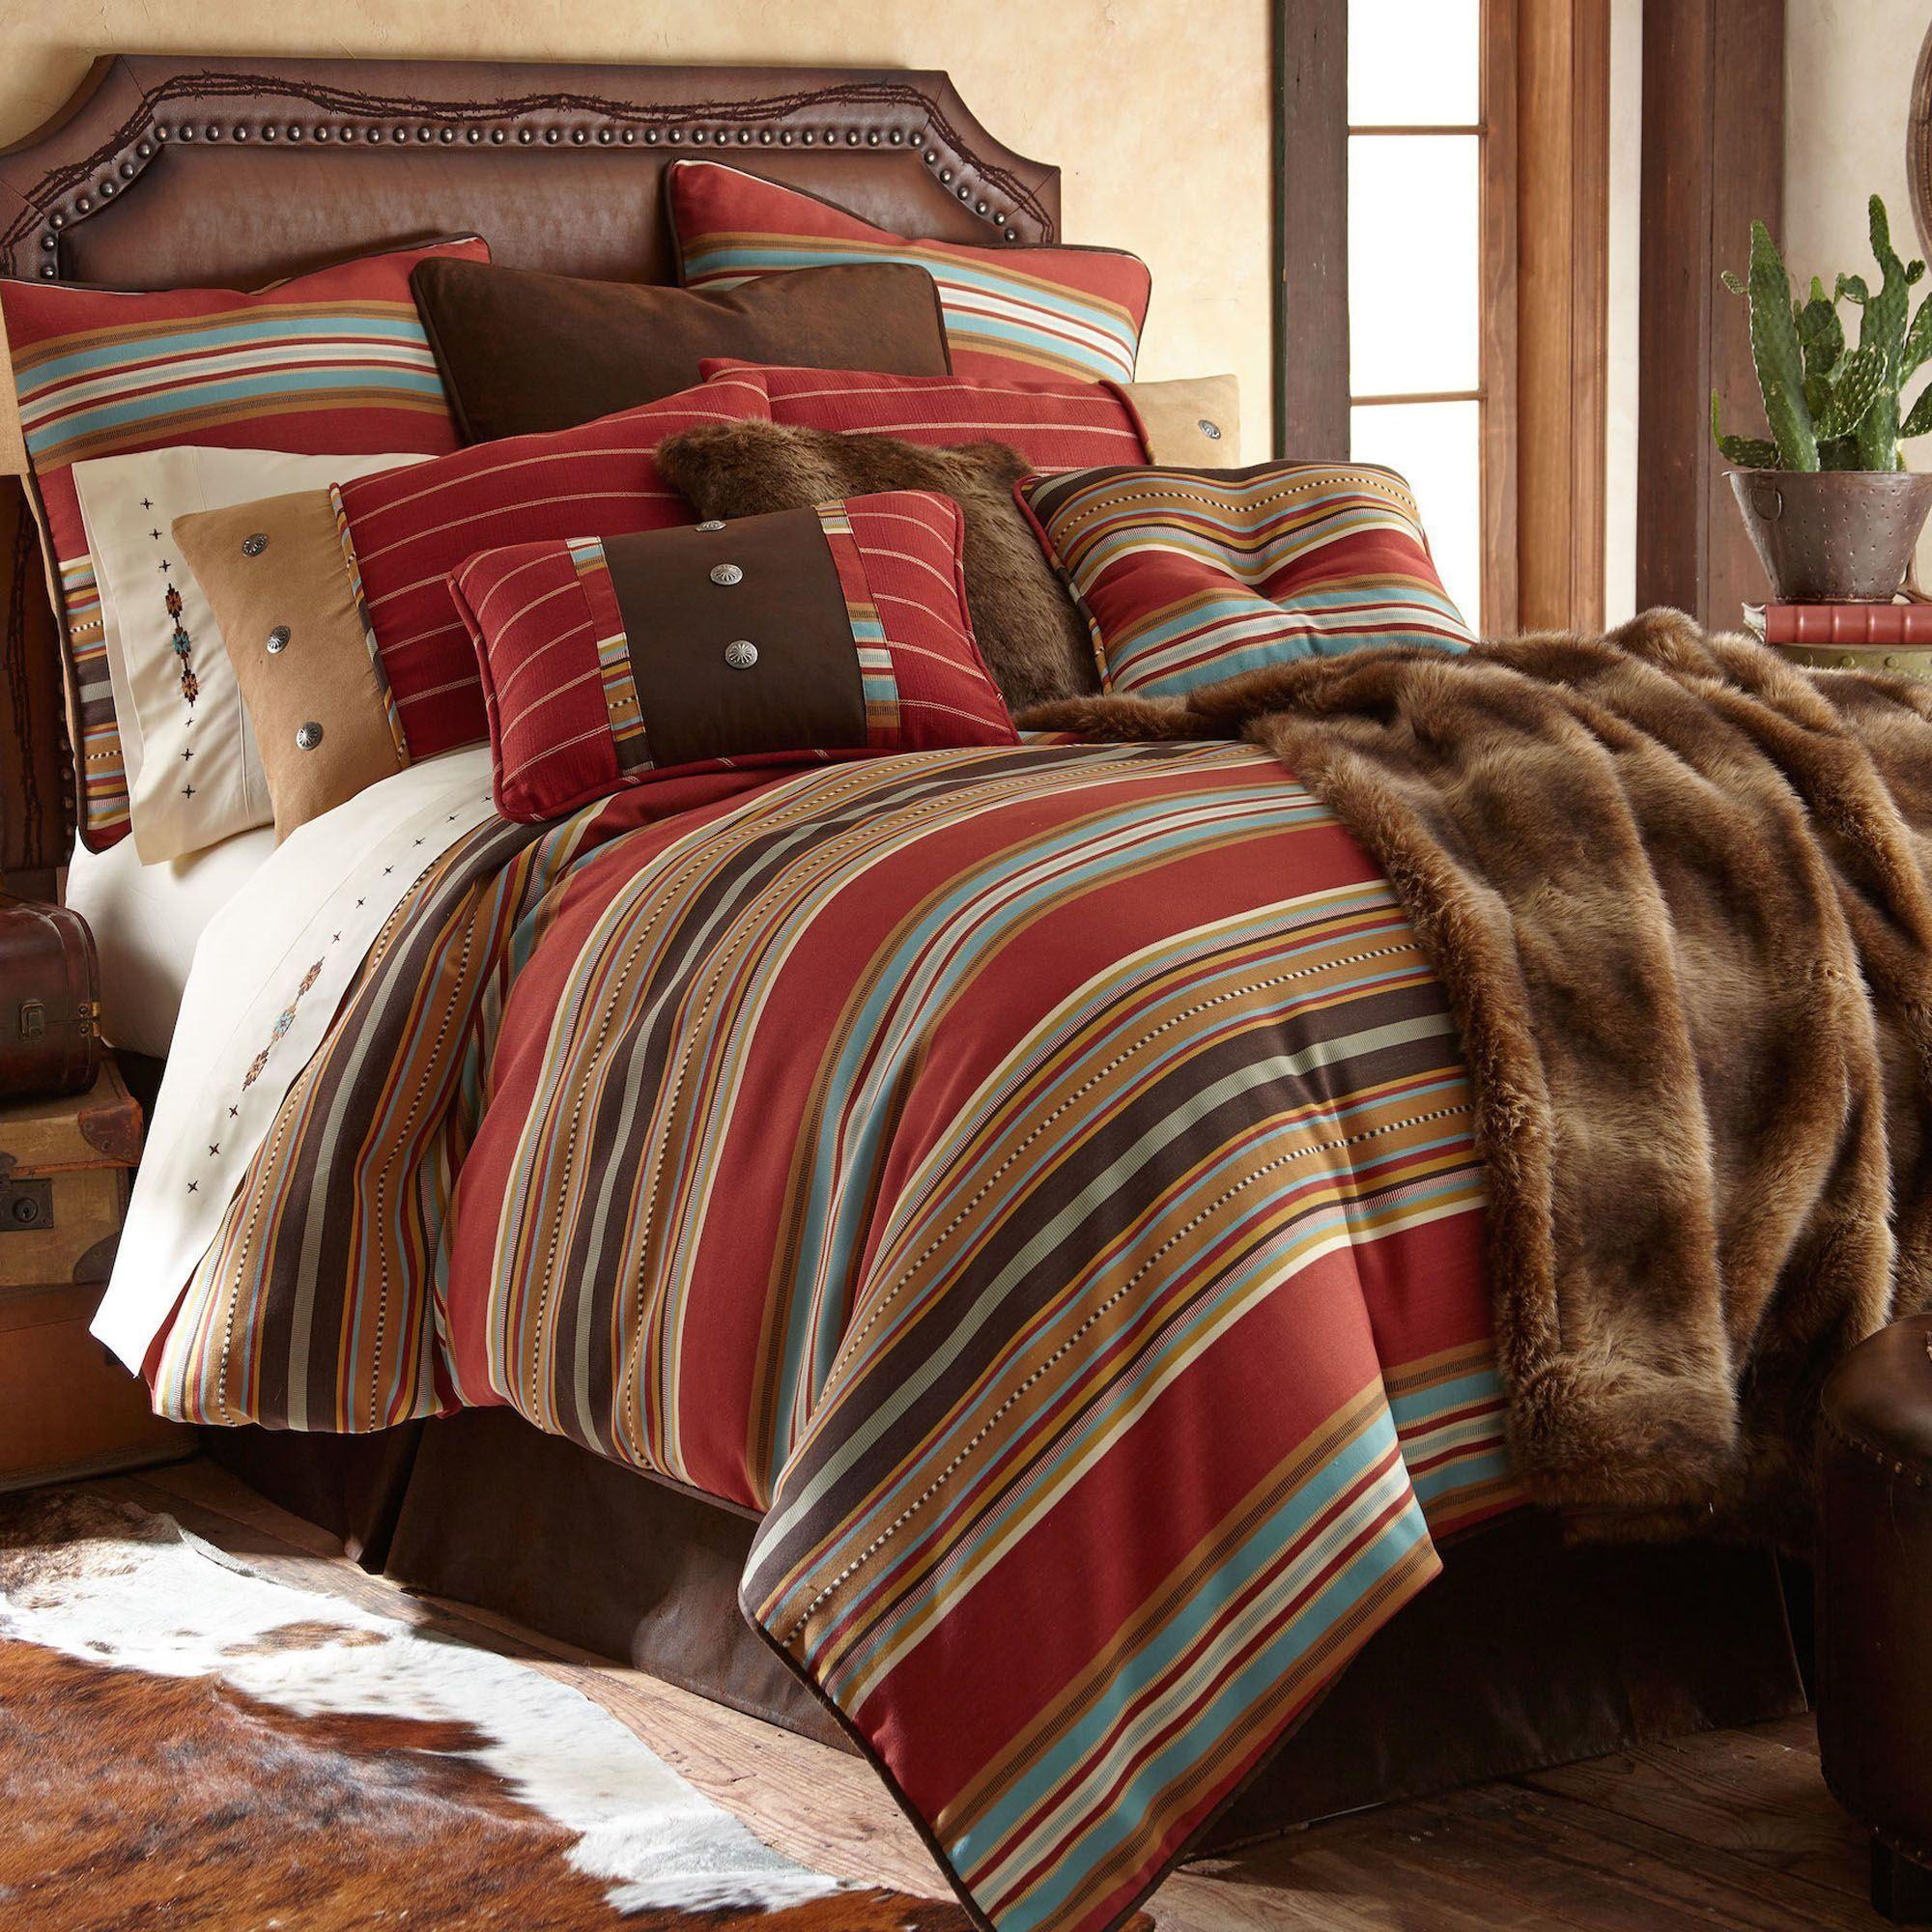 utagriculture com queen sets bedding warm southwestern comforter